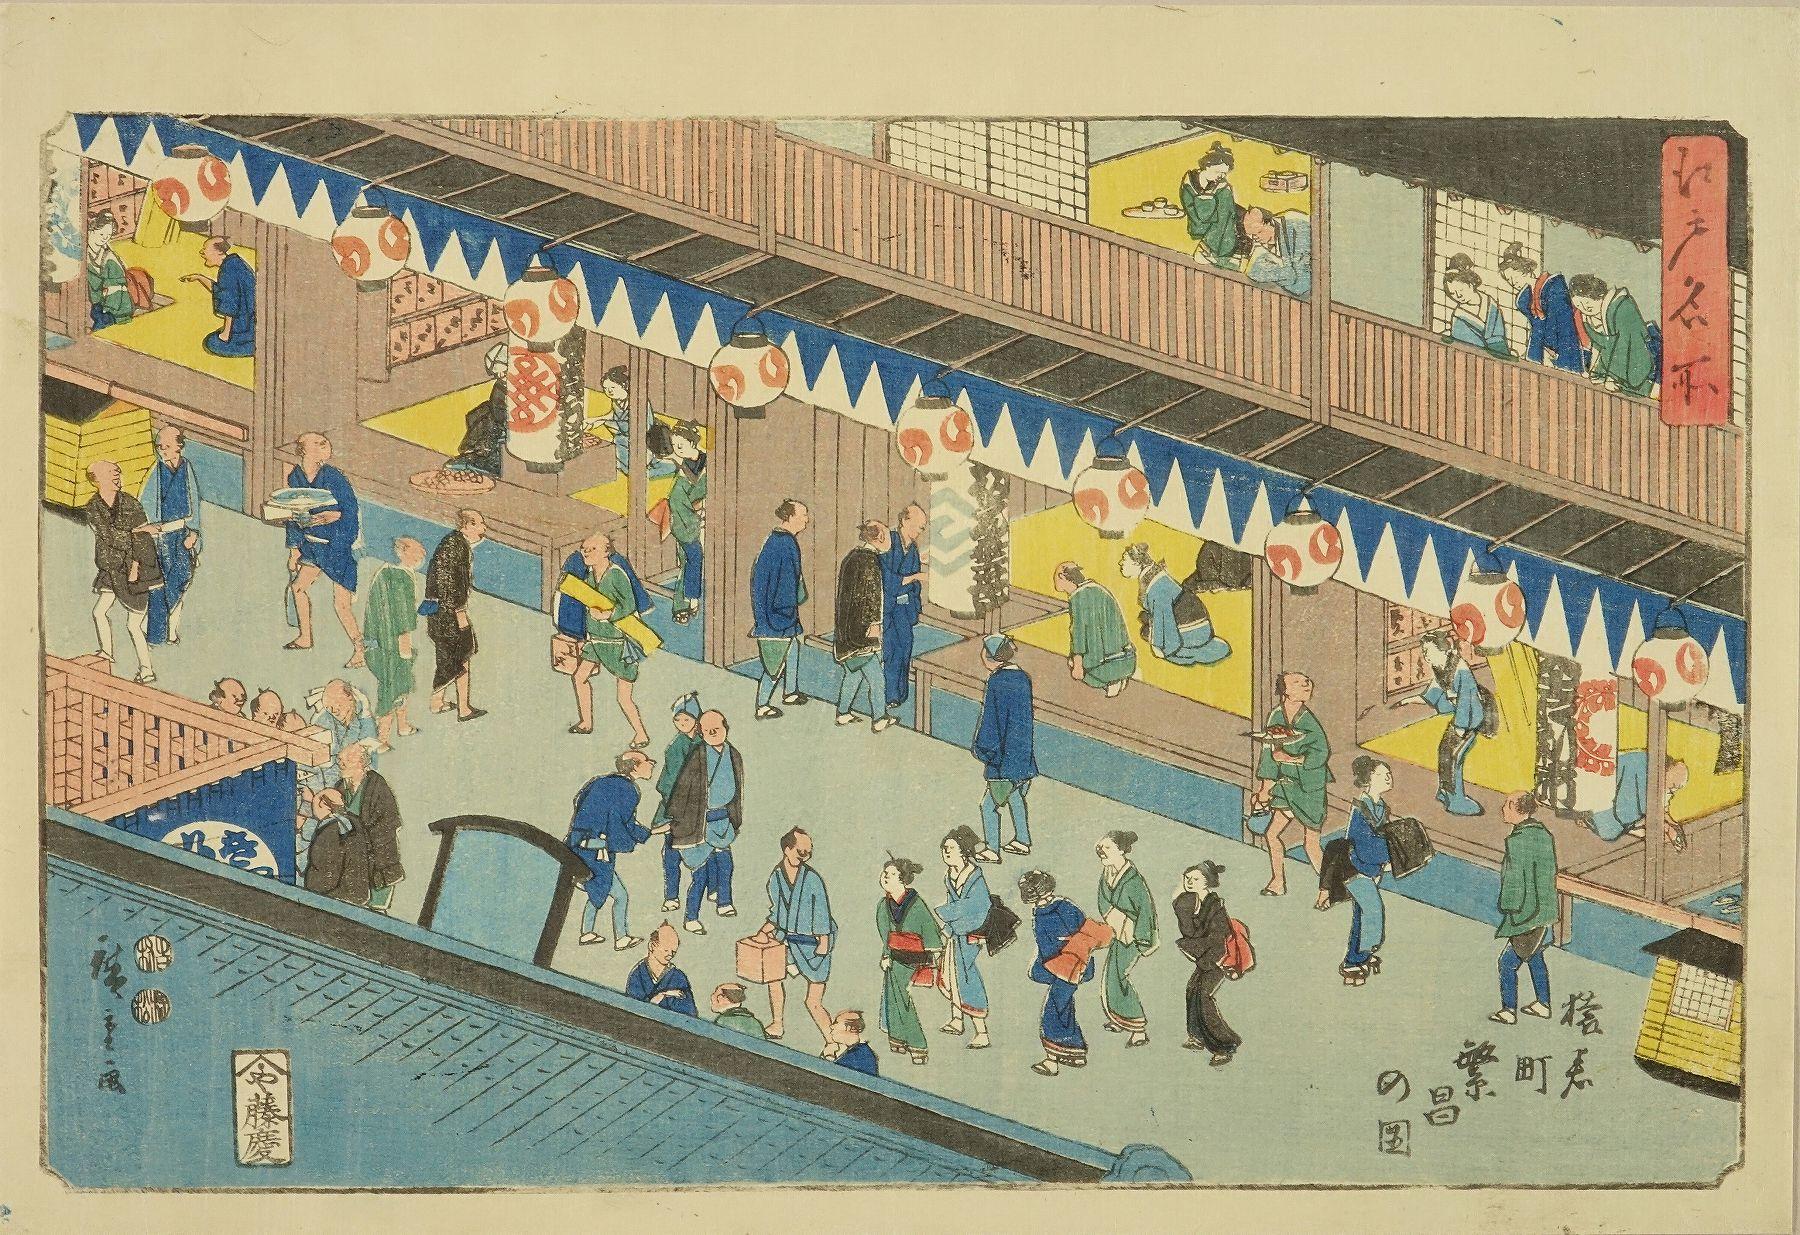 HIROSHIGE <i>Saruwakacho Hanjo no zu</i> (Prosperity of Saruwakacho), from <i>Edo meisho</i> (Famous places of Edo), published by Fujiokaya Keijiro